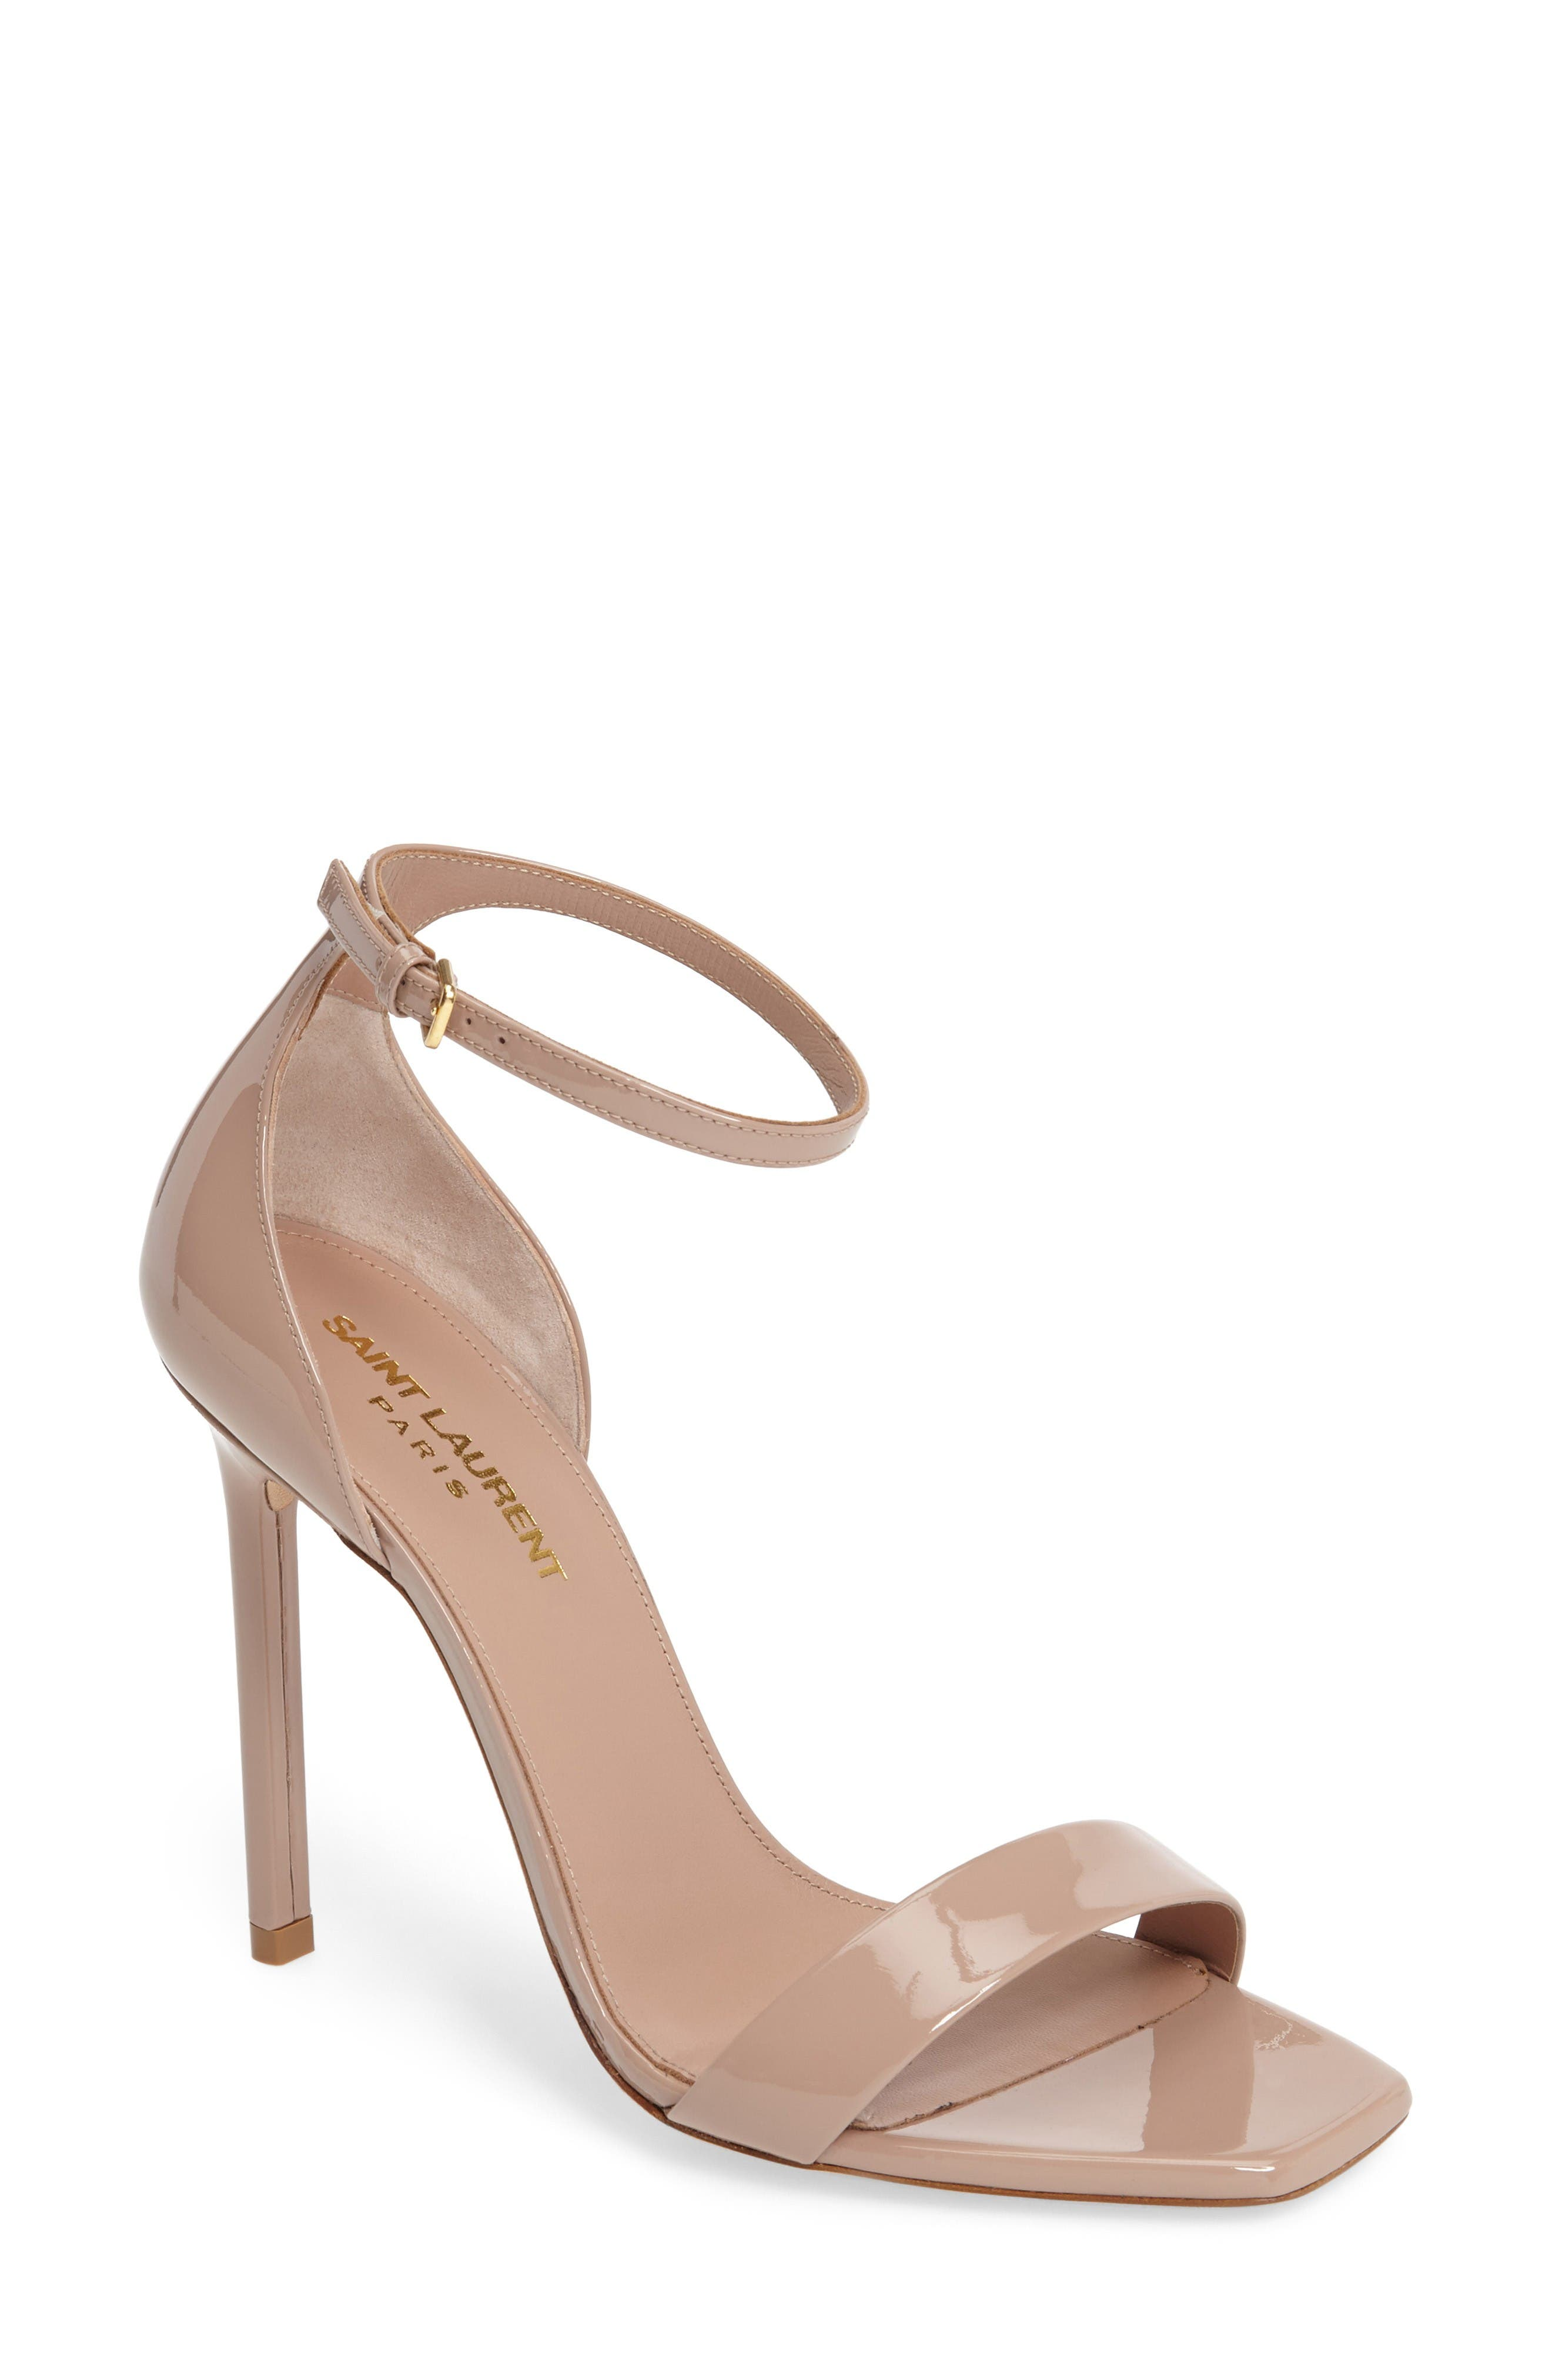 Main Image - Saint Laurent Amber Ankle Strap Sandal (Women)